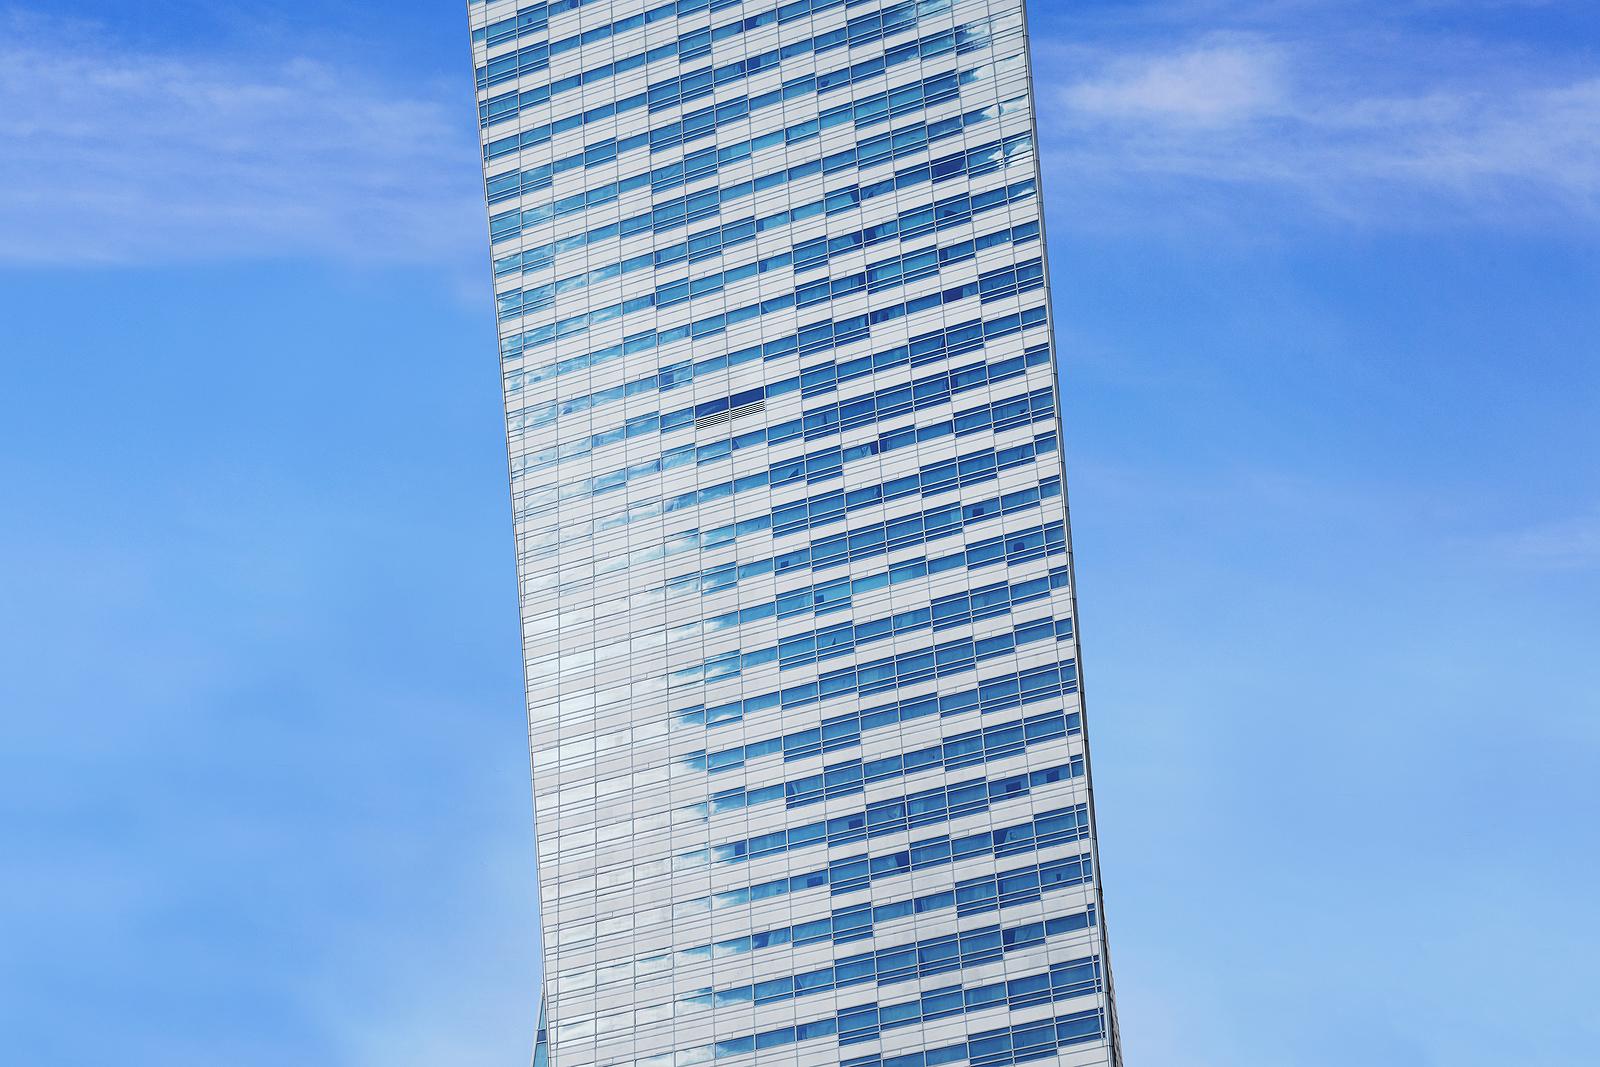 Libeskind's Zlota 44 skyscraper in Warsaw